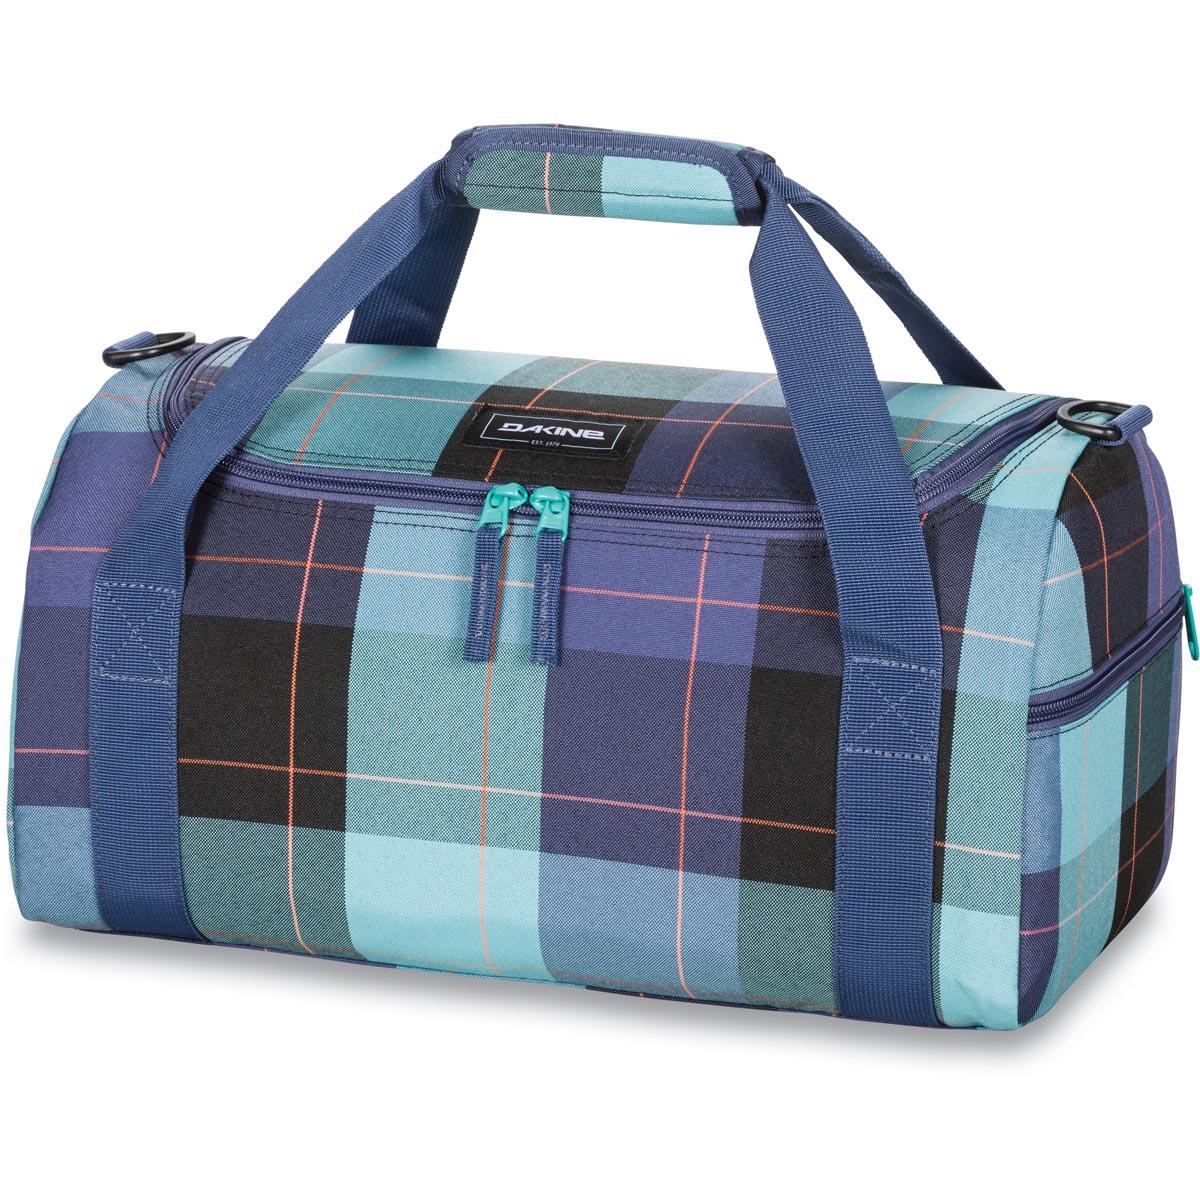 Dakine Eq Bag Sac de Sport Grand Format, 48 cm, Turquoise (Kalea)